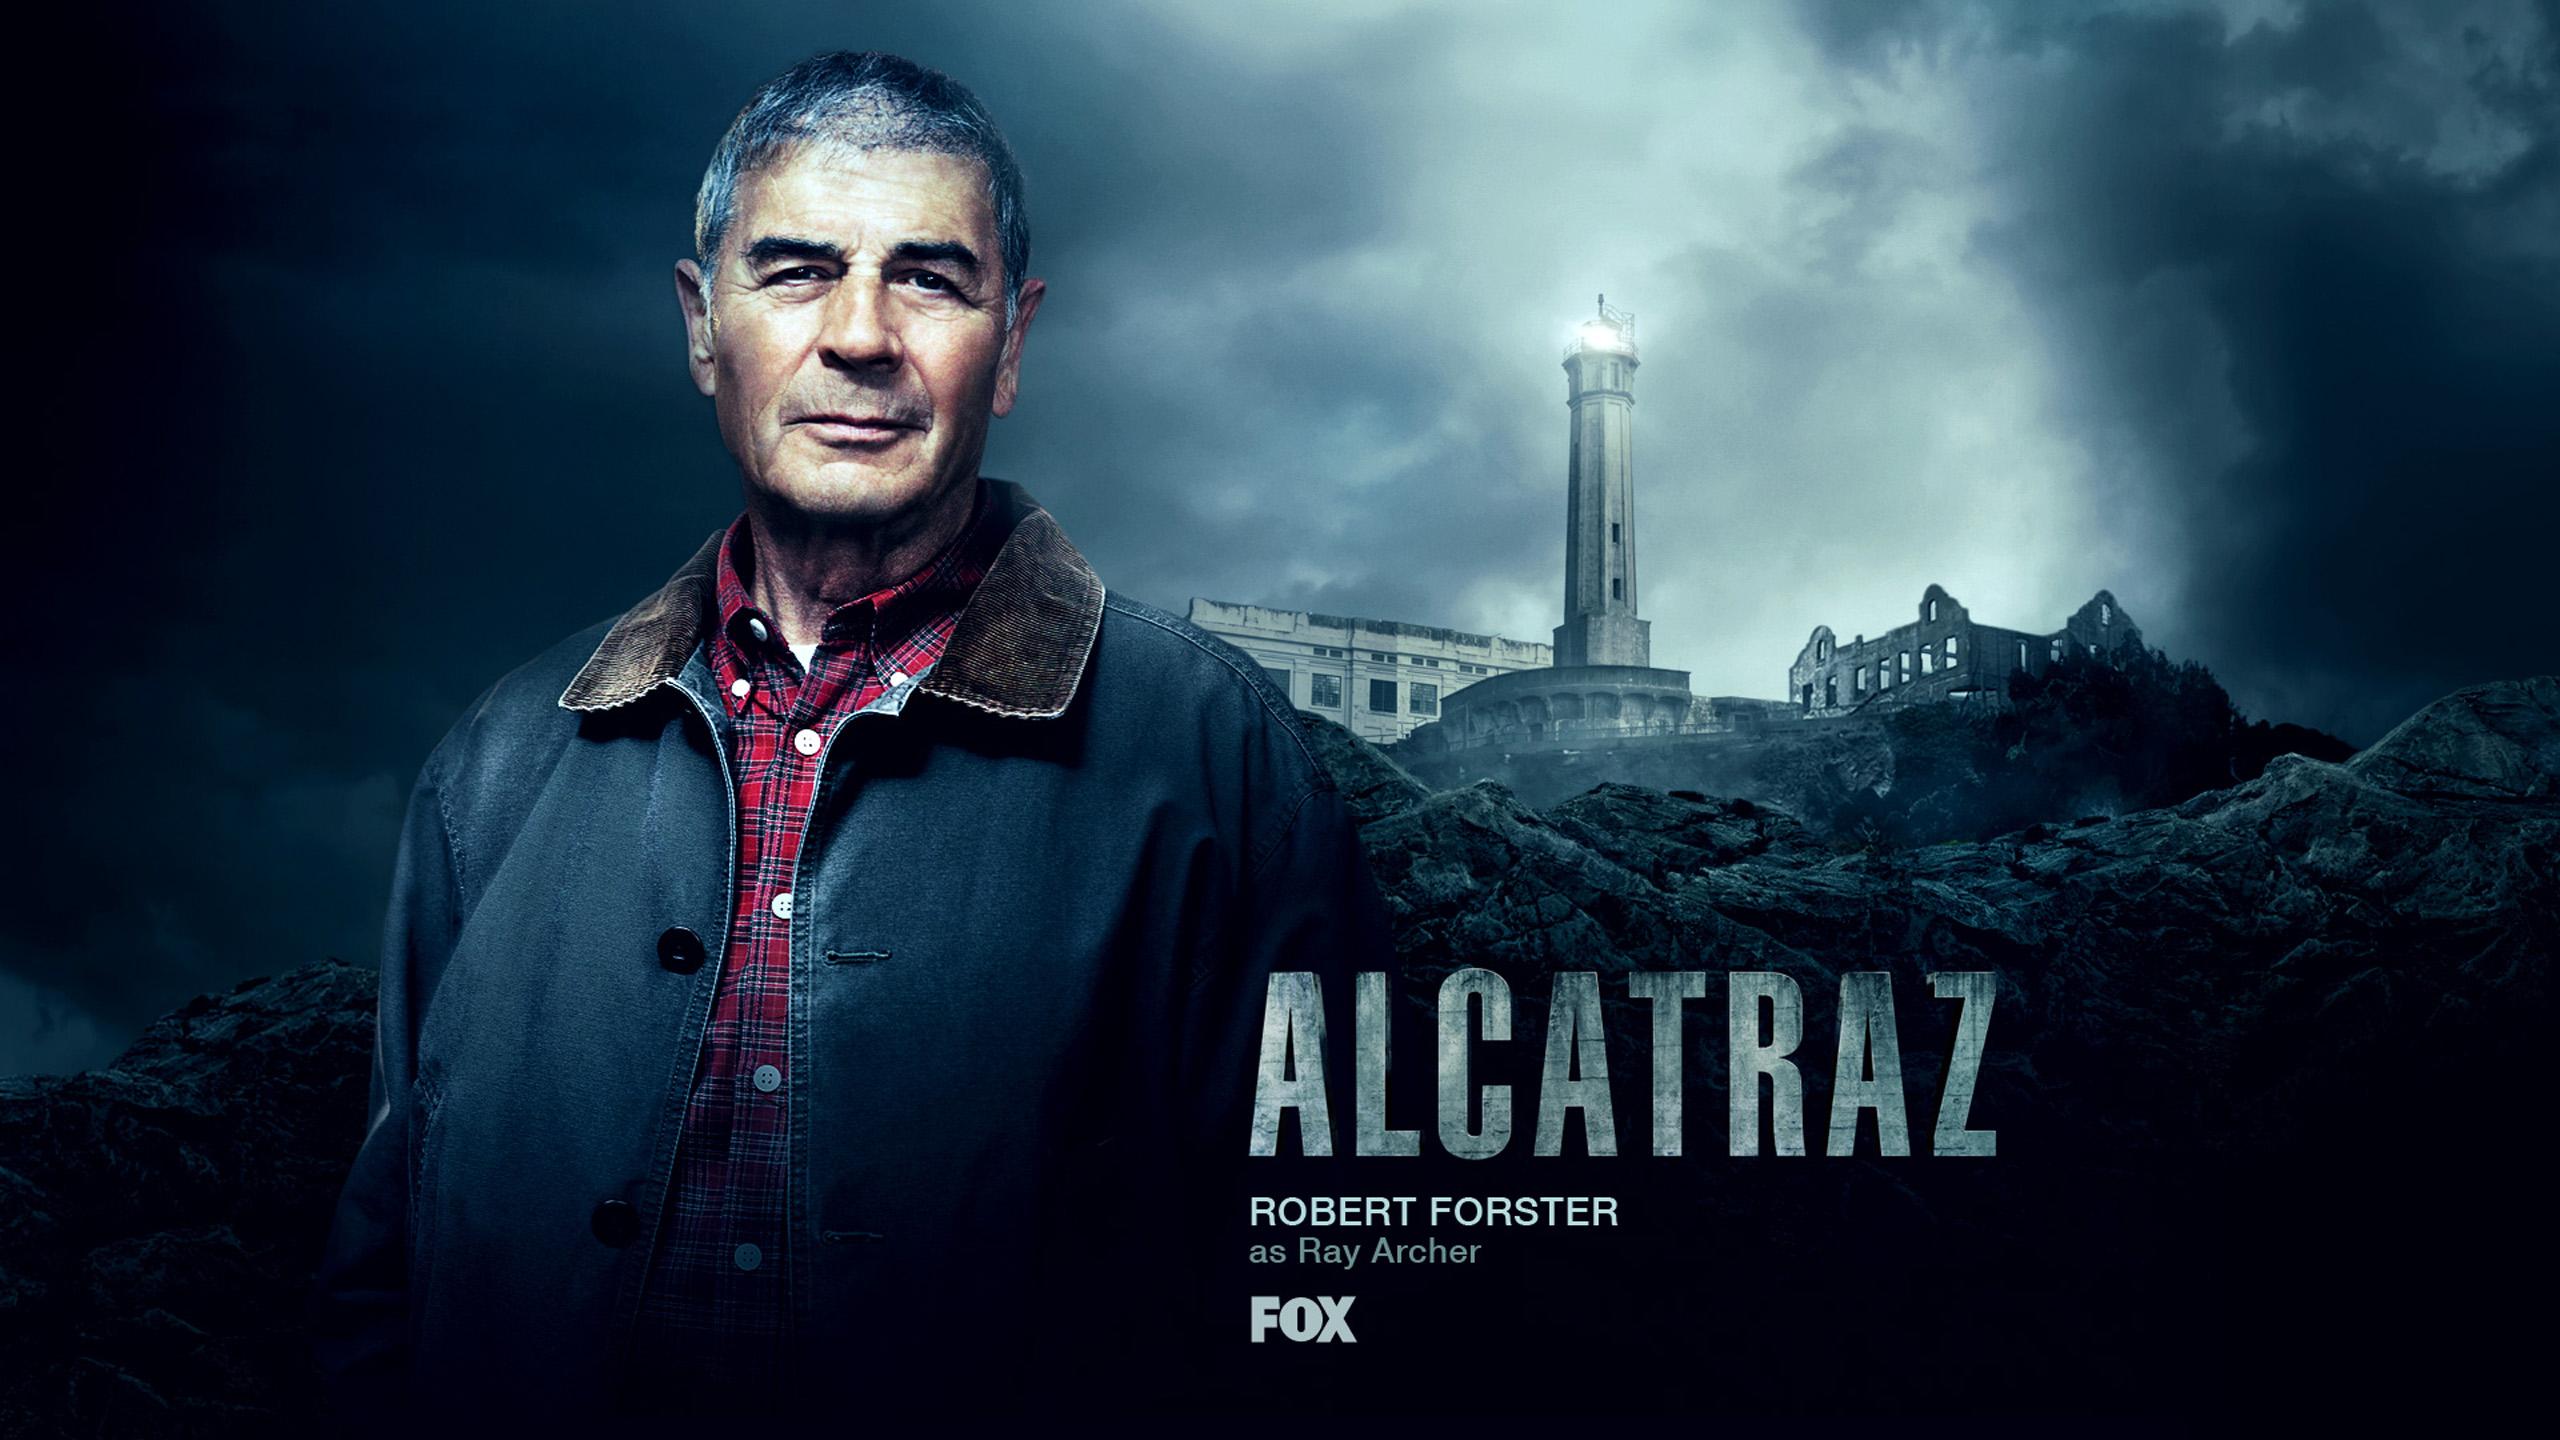 21987_alcatraz_wallpaper_07_122_357lo.jpg